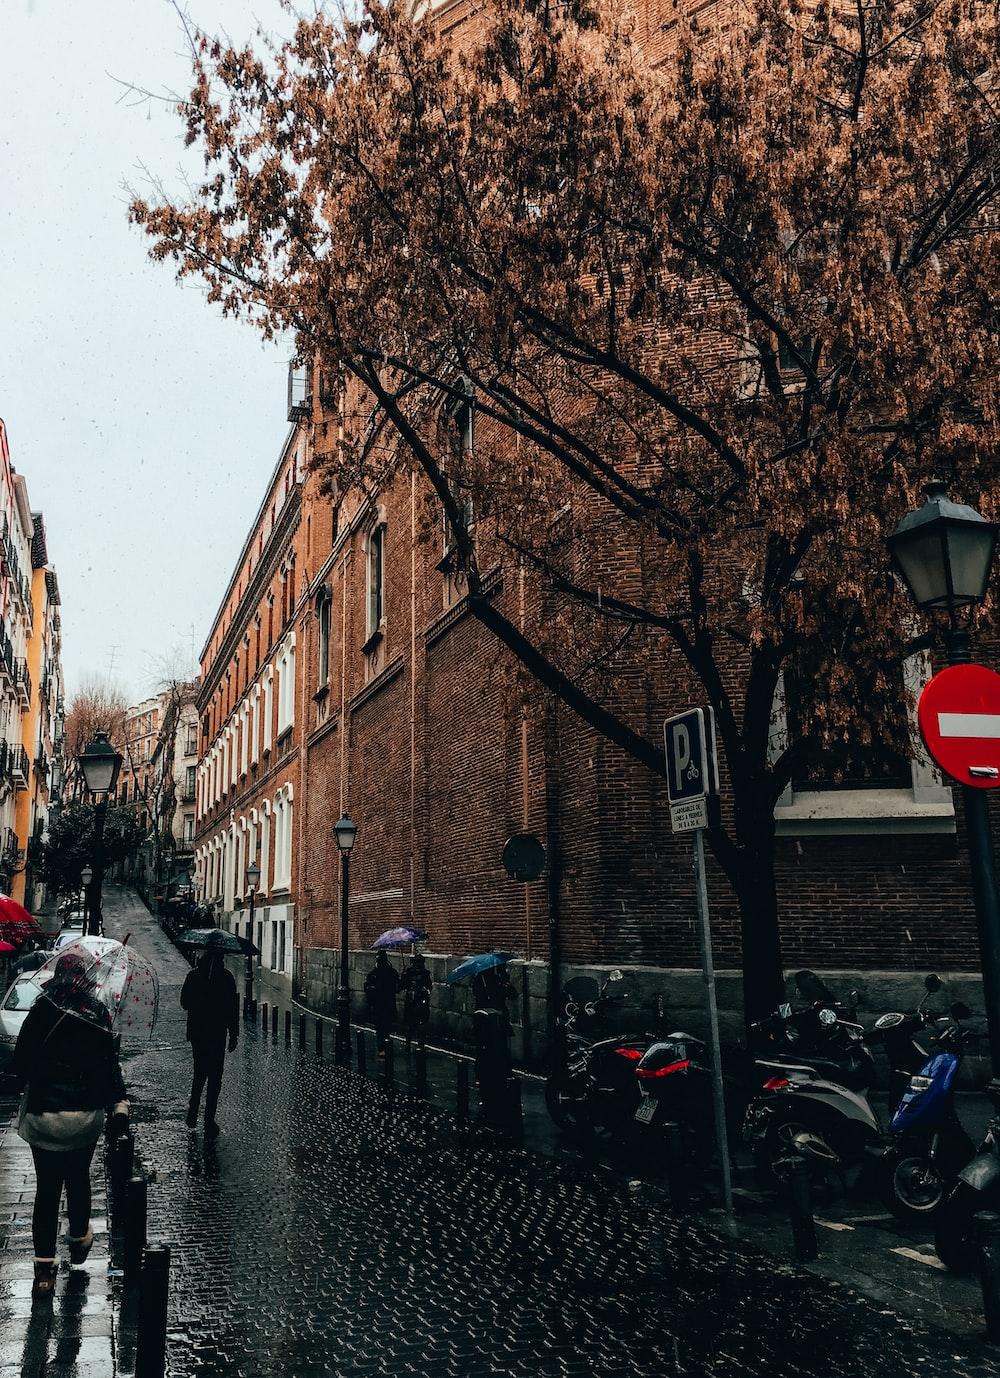 person holding umbrella walking between buildings